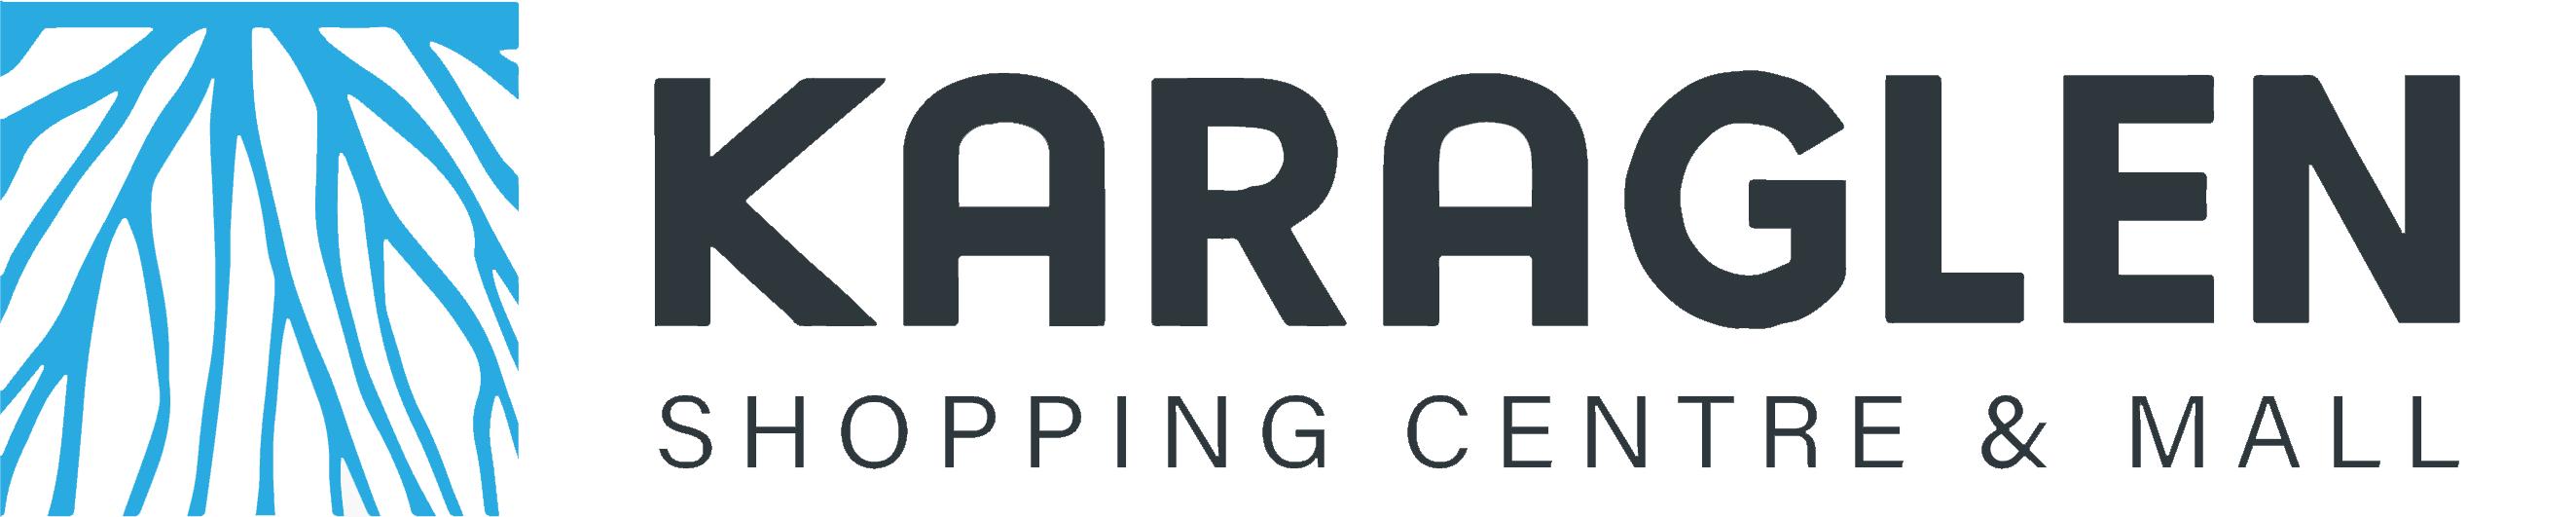 Karaglen Shopping Centre & Mall